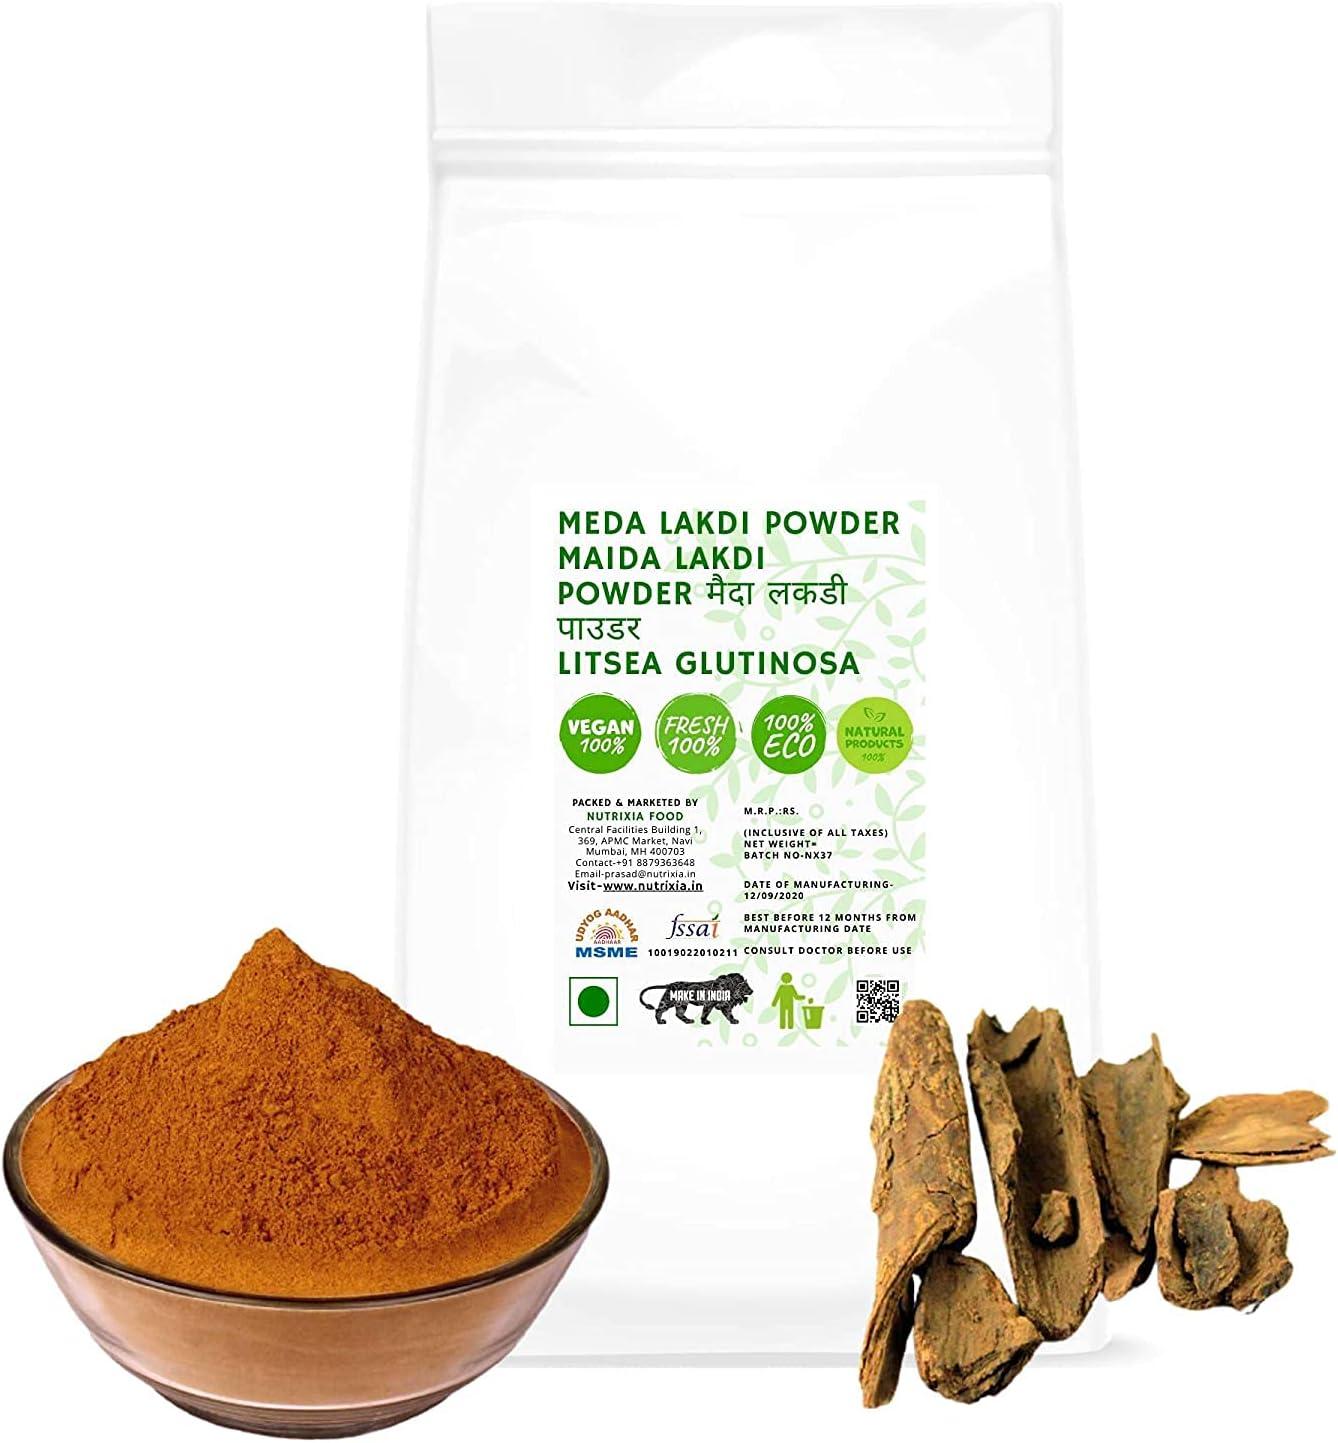 Marbella MEDA Lakdi Powder - Cheap SALE Start ????? Classic Maida ???? Powder-